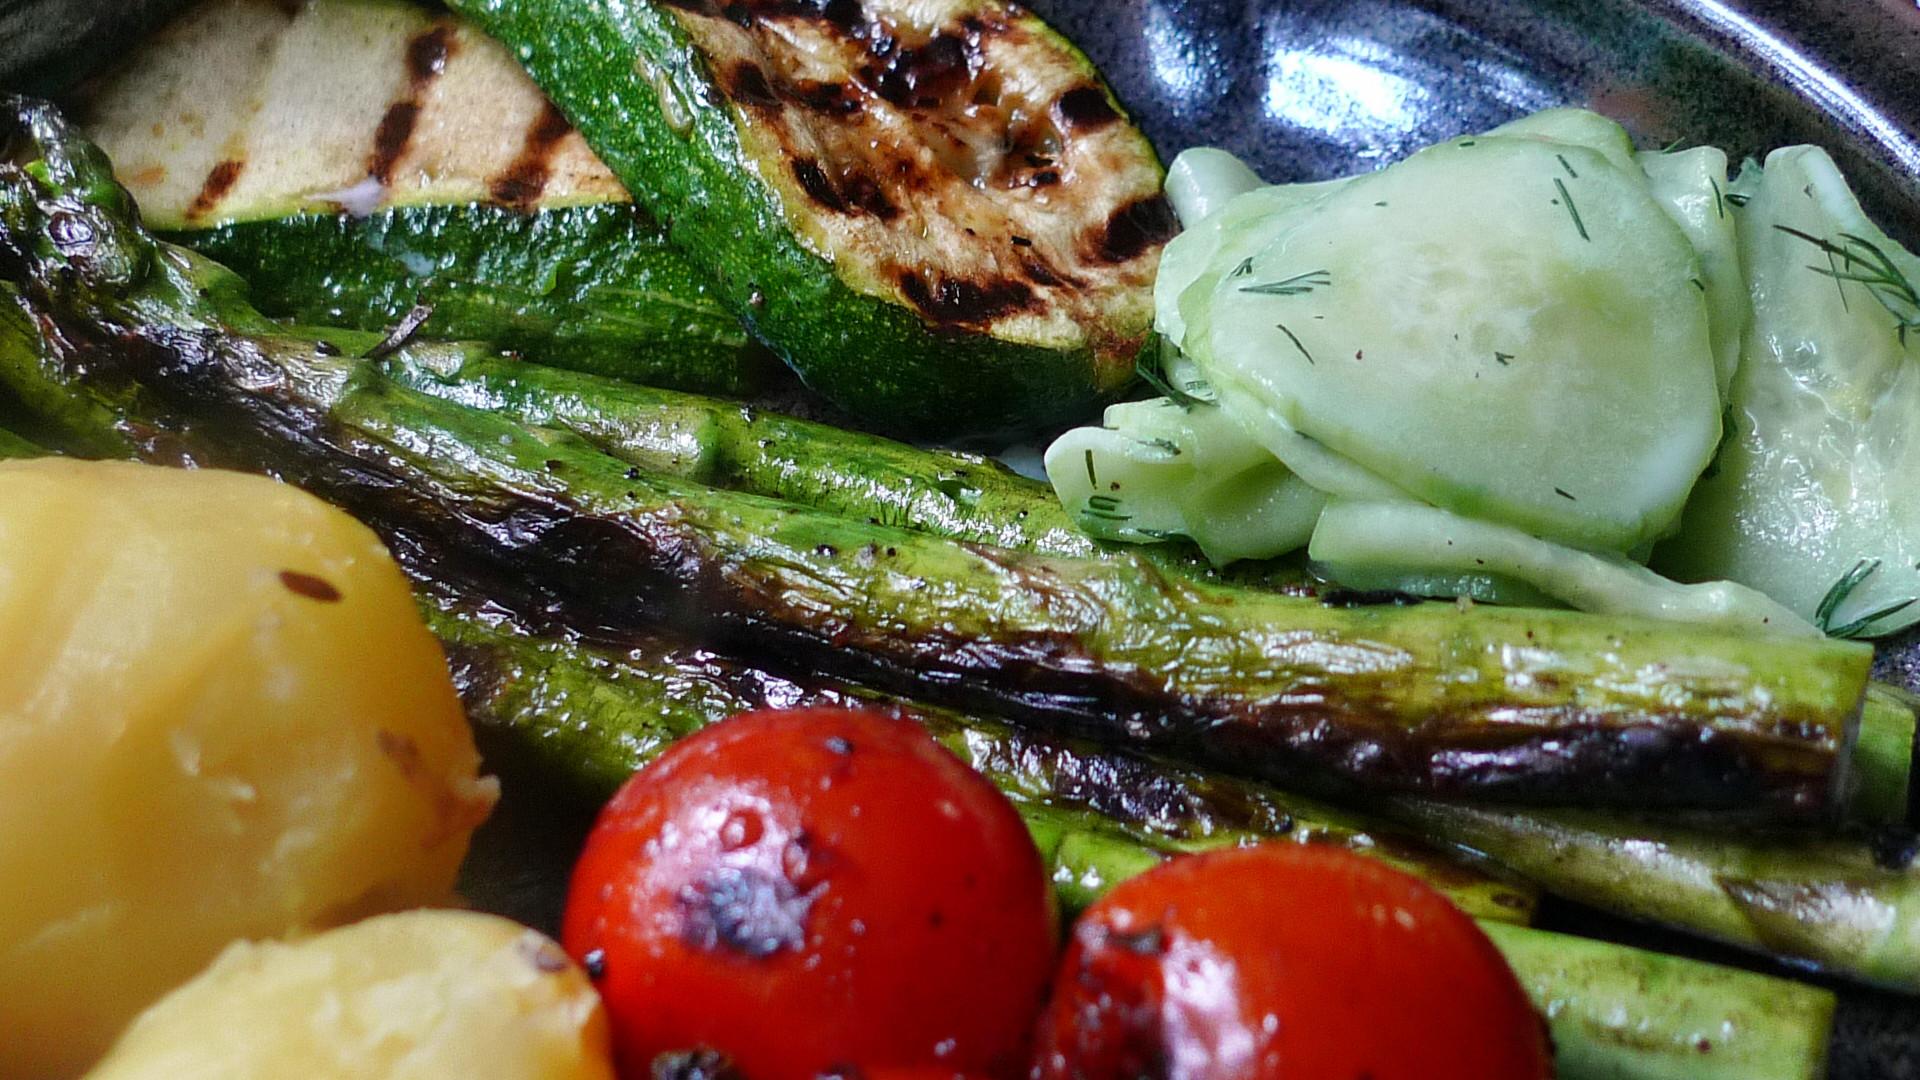 Spargel,Zucchini,Tomate,Gurkensalat,Kartoffeln -3.5.15   (13)